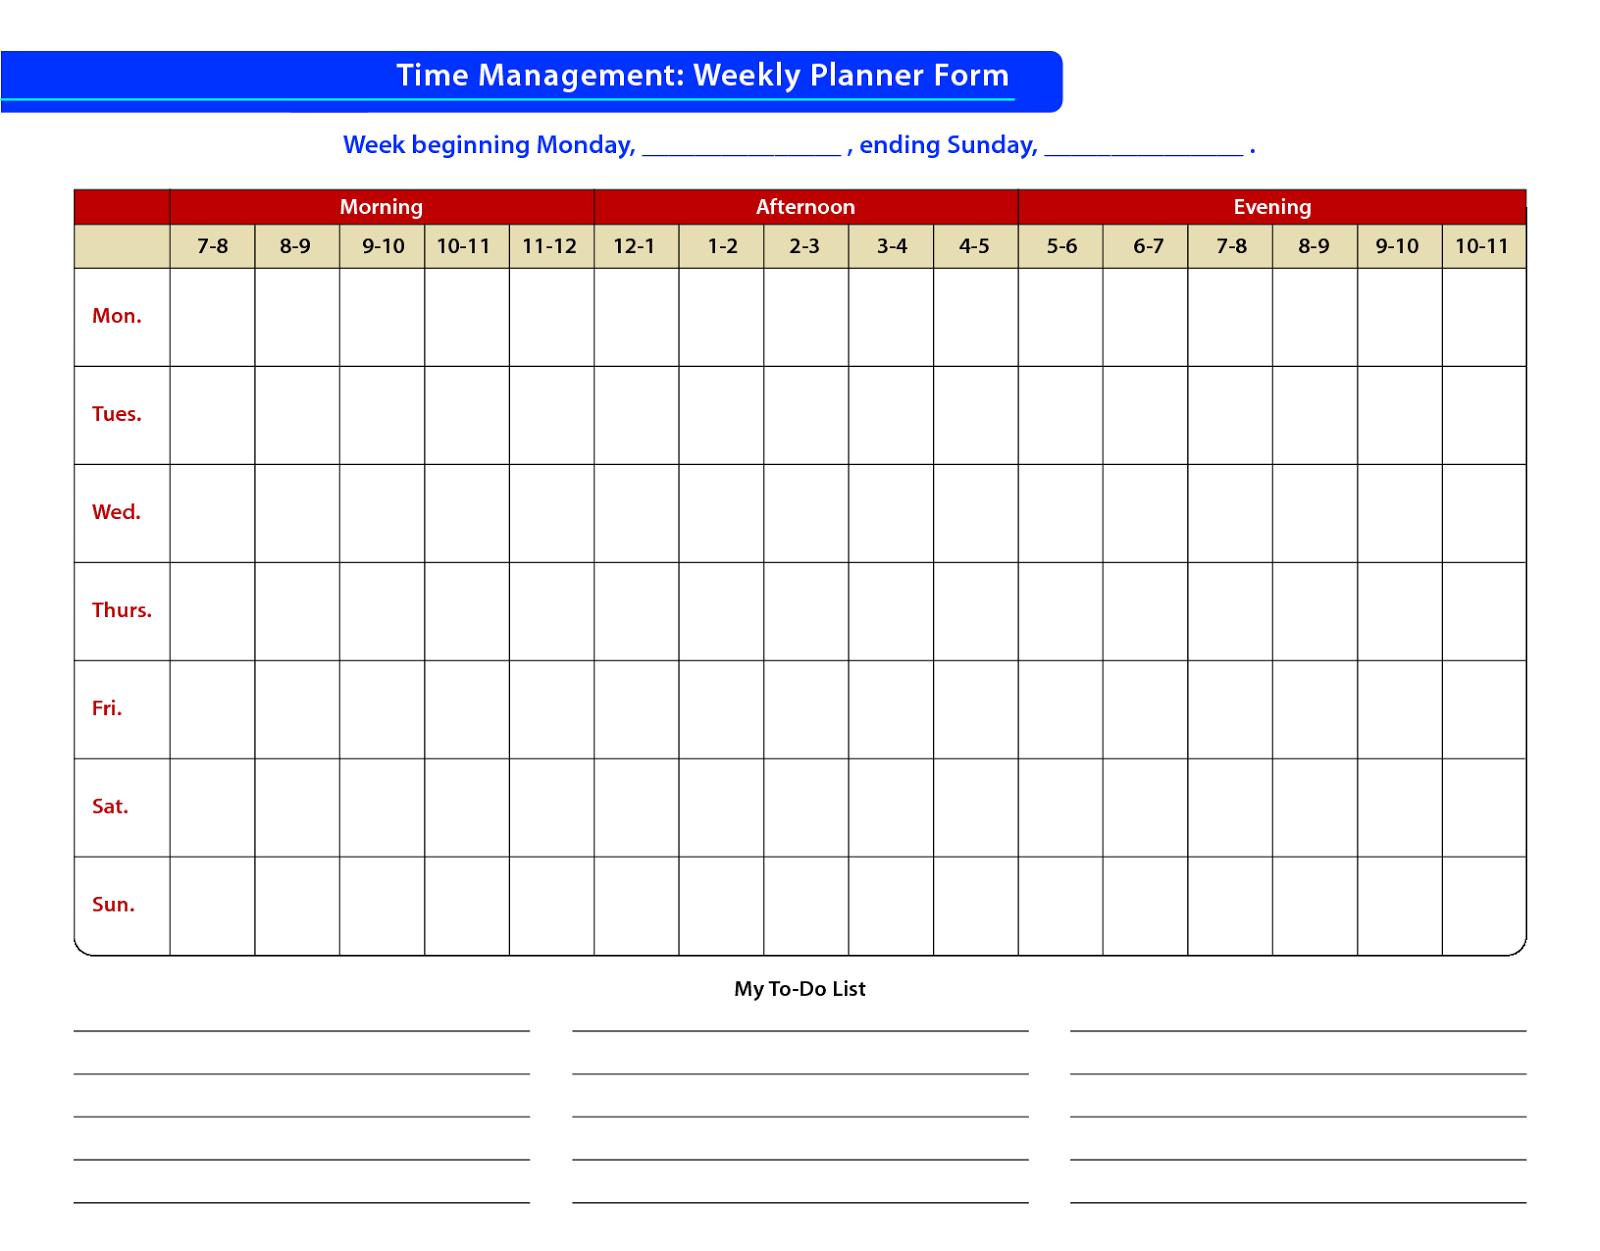 faudzil.blogspot.com: TIME MANAGEMENT - Sample of Time Management Log